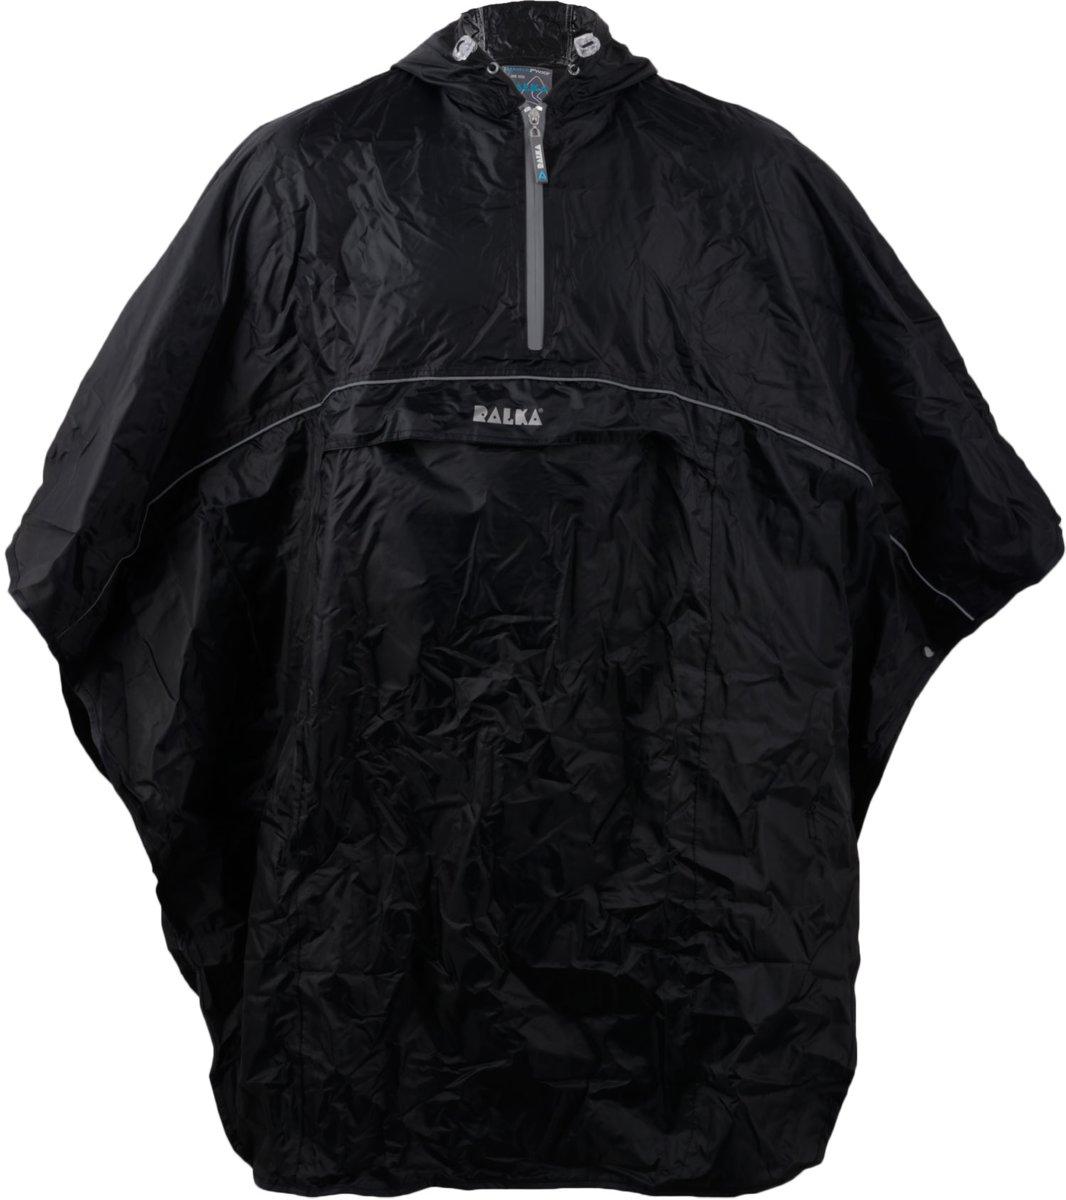 Ralka Poncho - Zwart - One size kopen